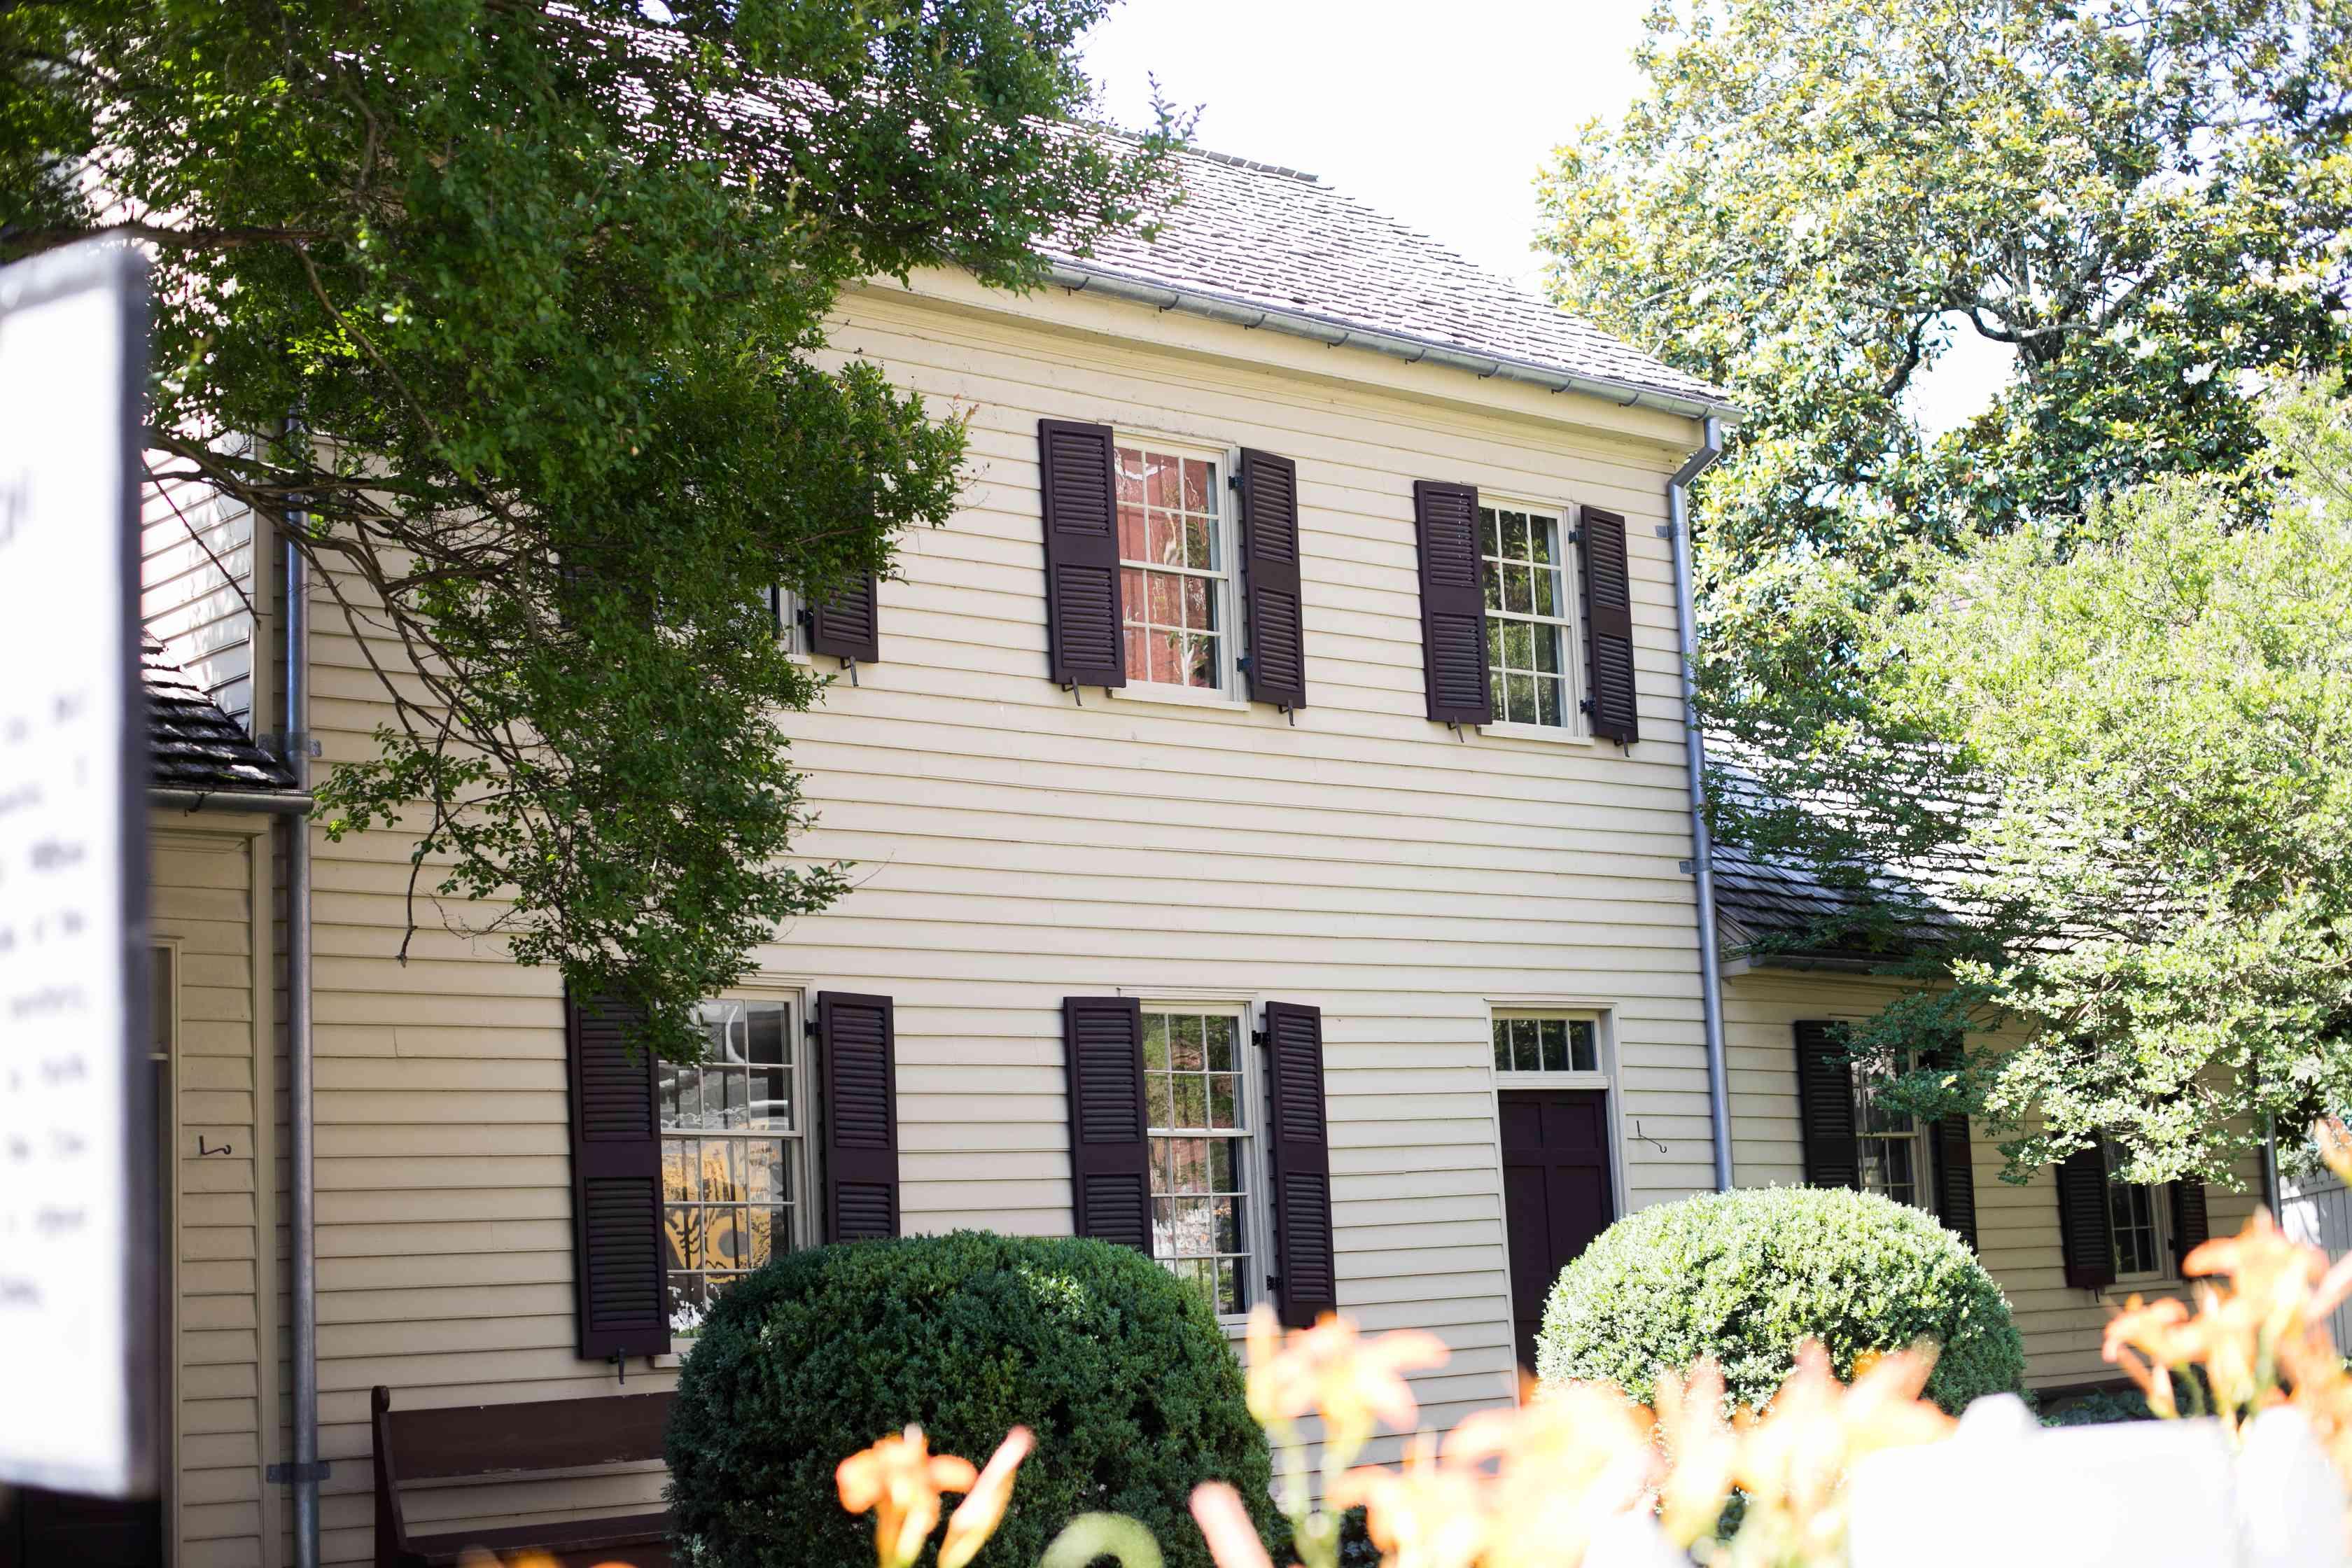 Exterior of Blount Mansion